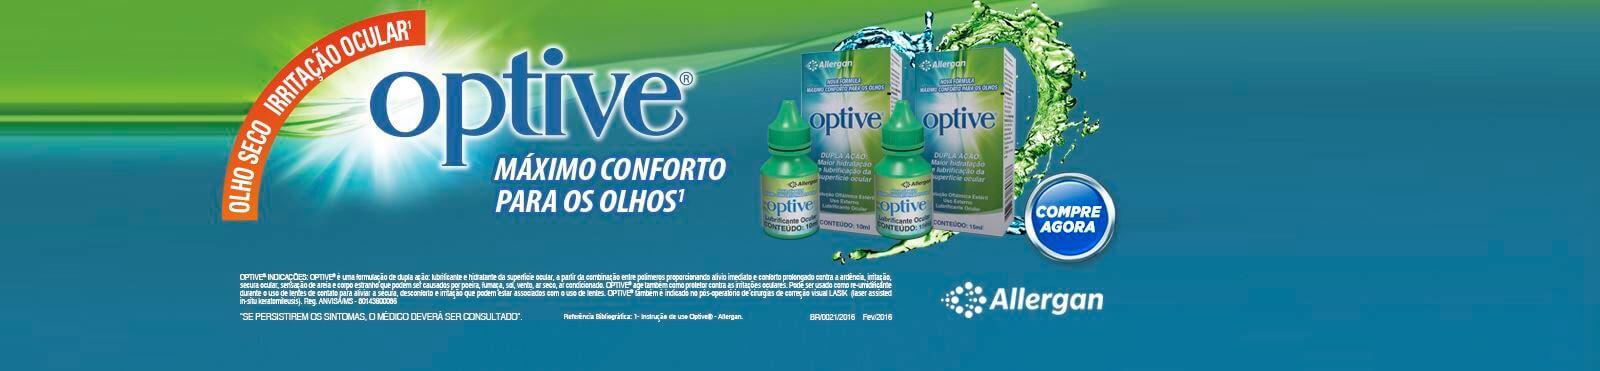 lubrificante-ocular-optive-fevereiro-allergan